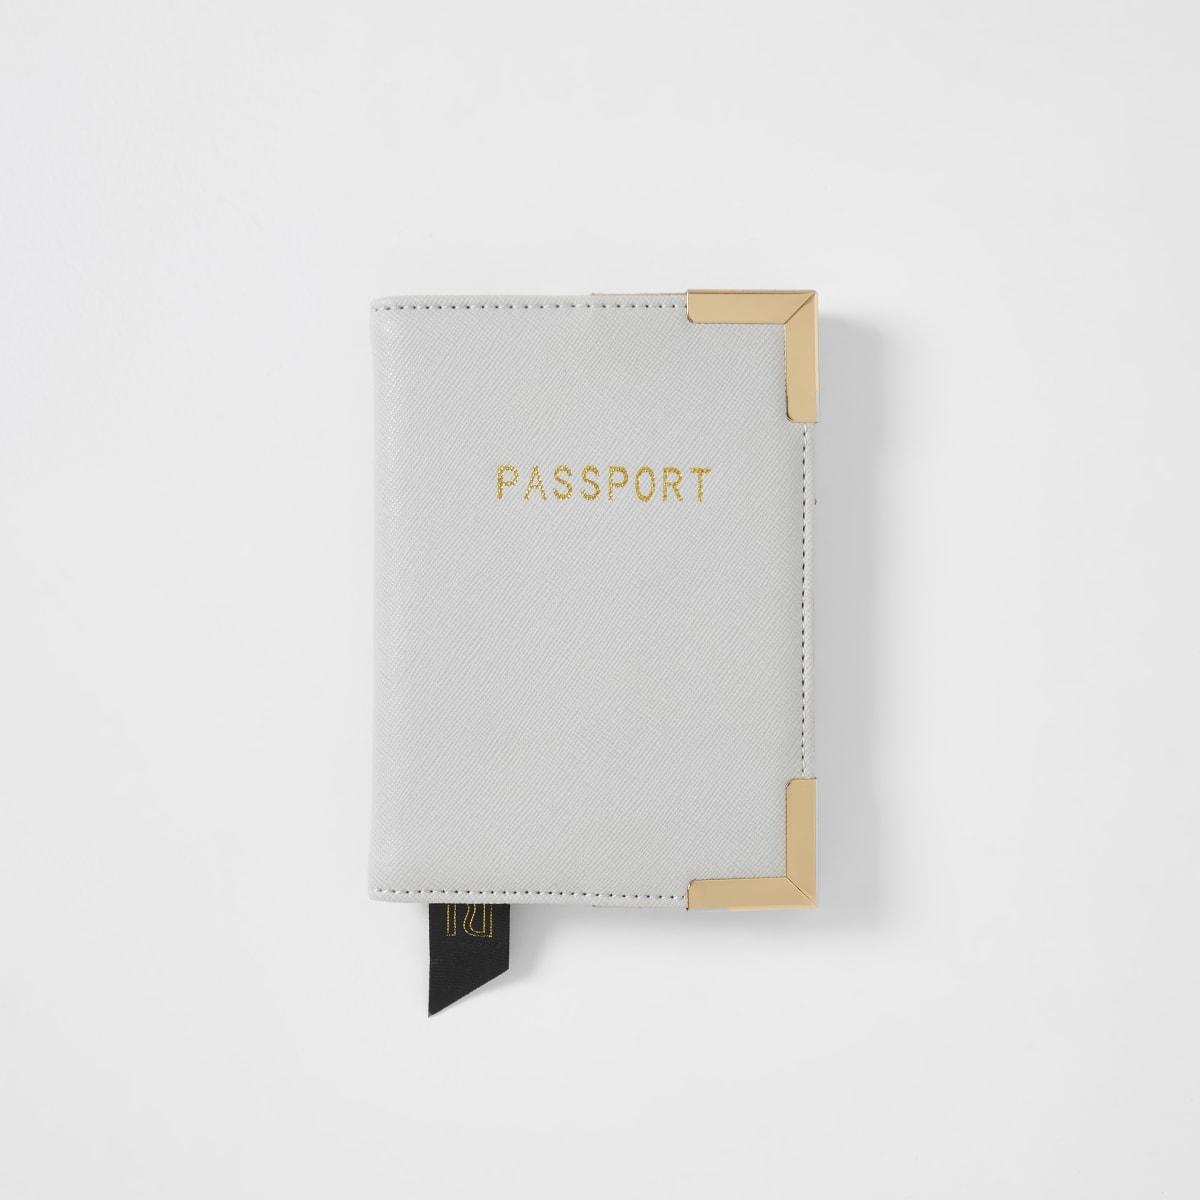 Porte-passeport gris clair